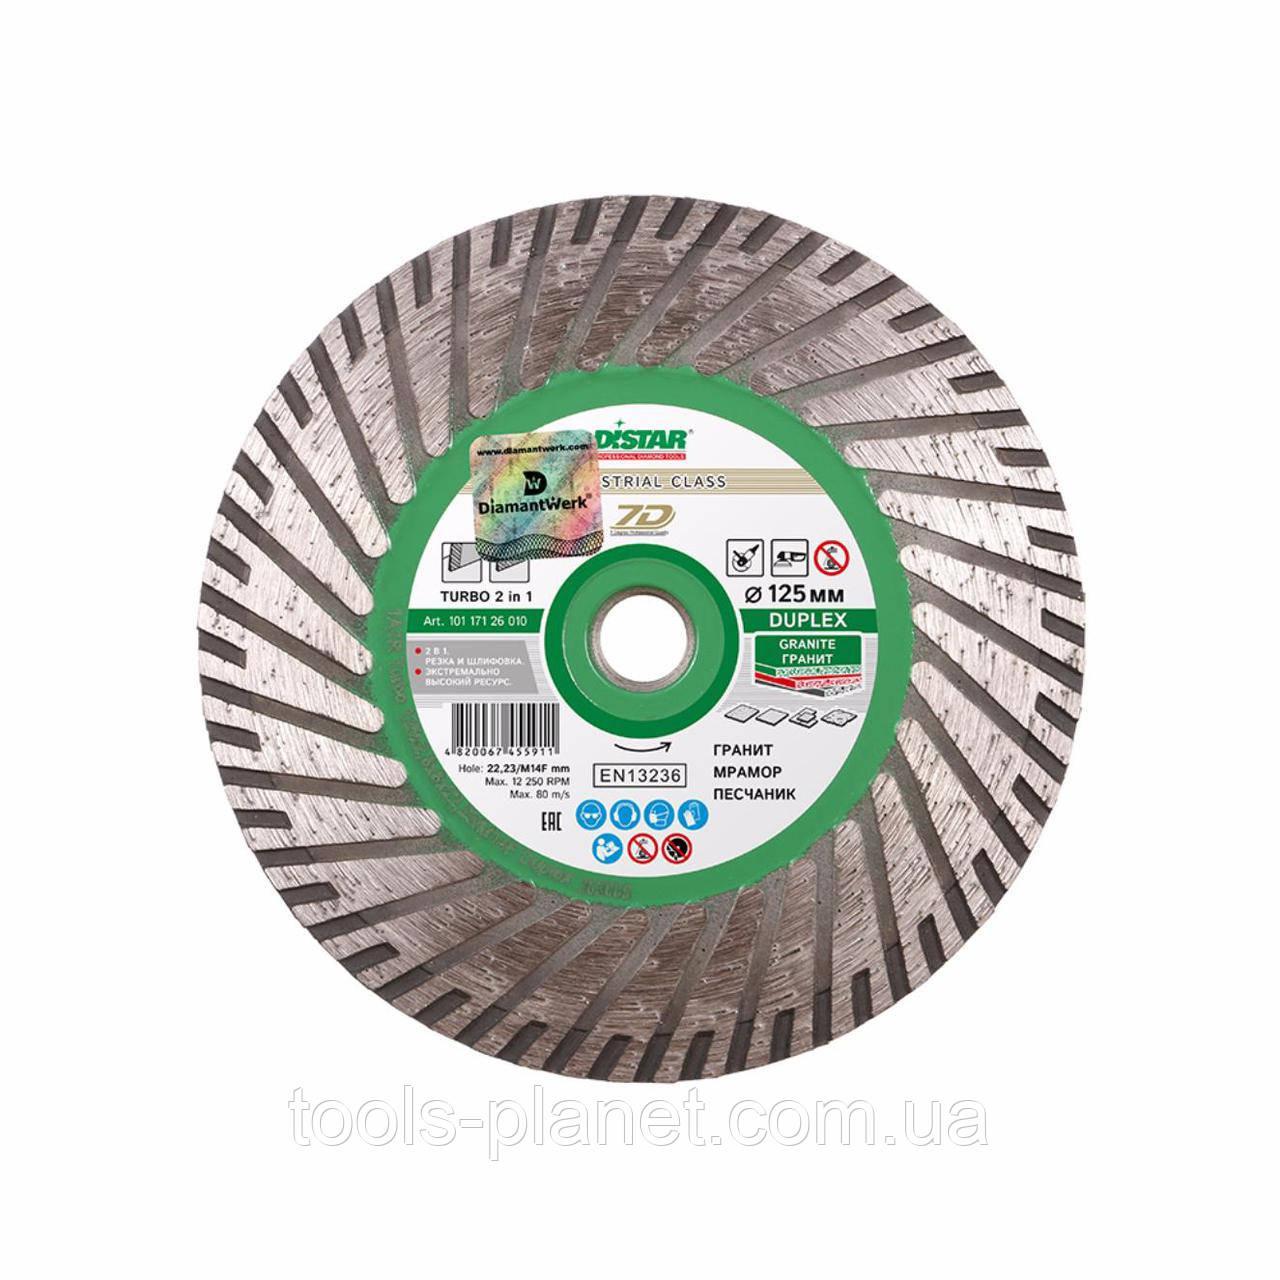 Алмазный диск Distar 1A1R Turbo 125 x 2,8 x 8/25 x 22,23 / M14F Duplex 7D (10117126010)